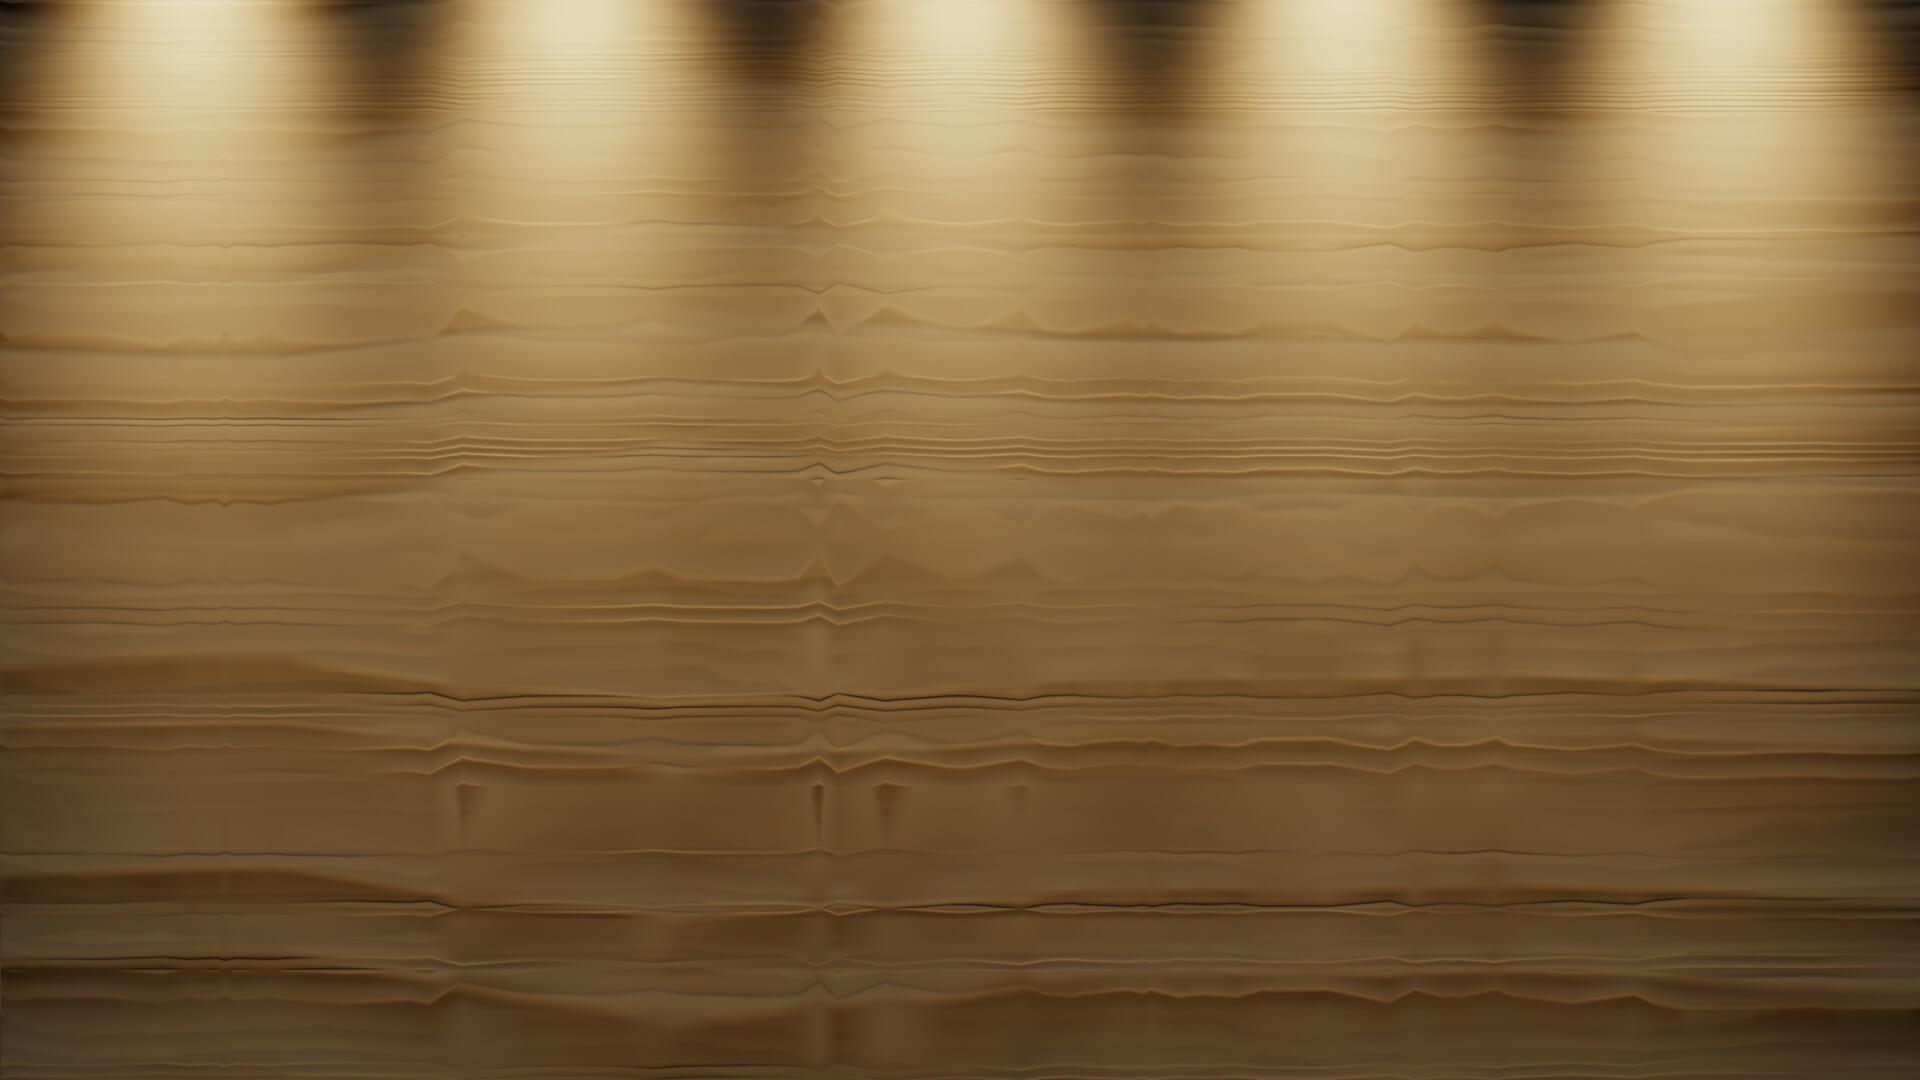 Wallpaper 1920x1080 surface wood light texture full hd 1080p wallpaper 19201080 surface wood light texture full hd 1080p voltagebd Choice Image